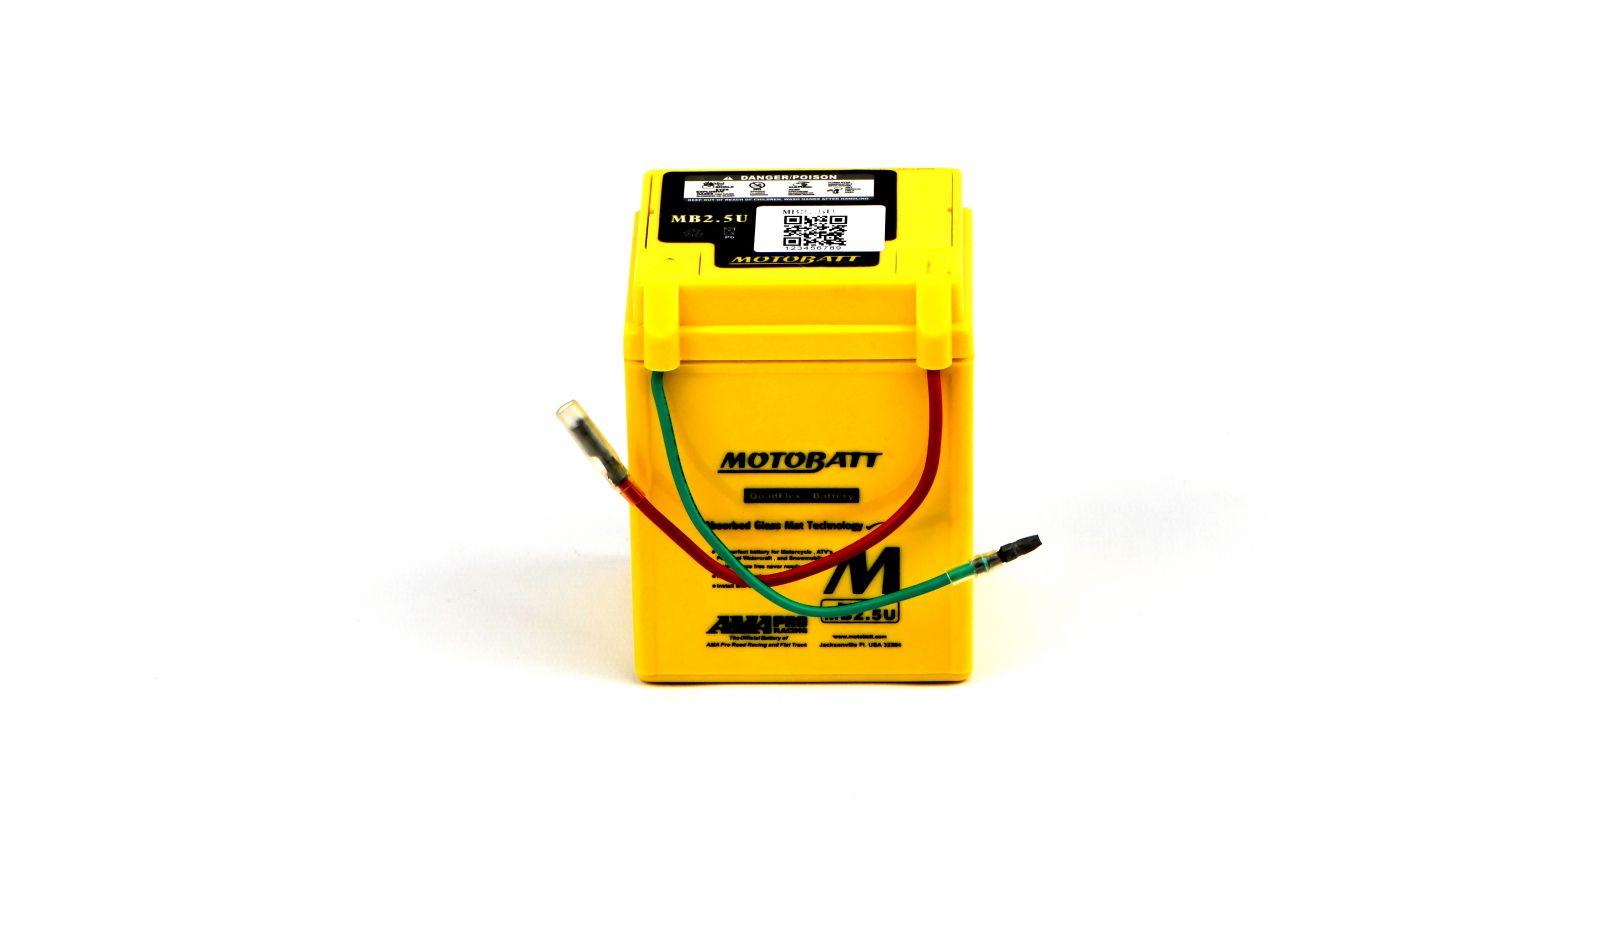 Motobatt Batteries - 501025MY image